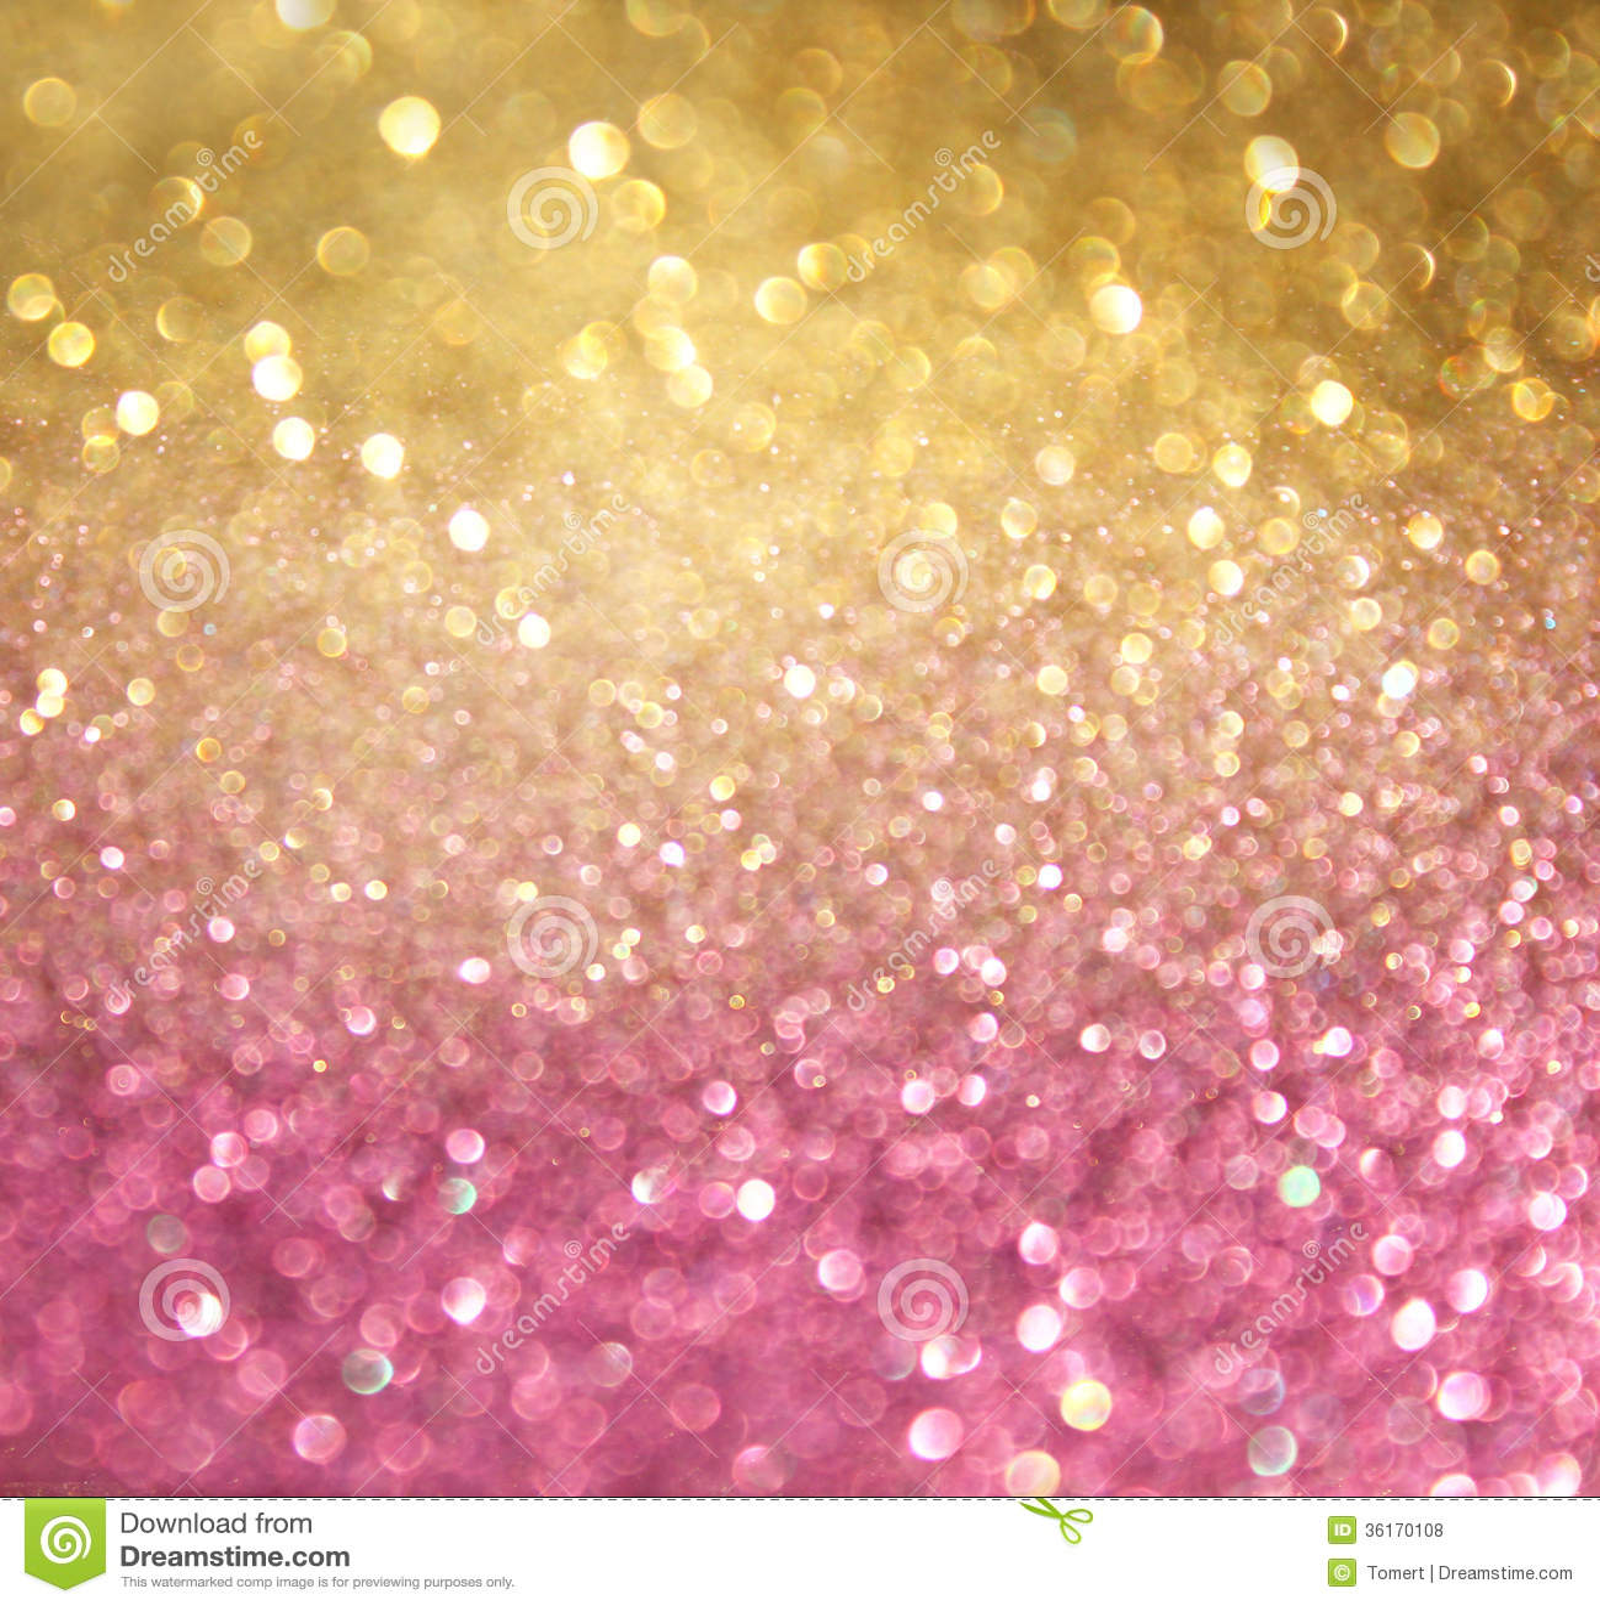 金子和桃红色抽象bokeh光。defocused背景